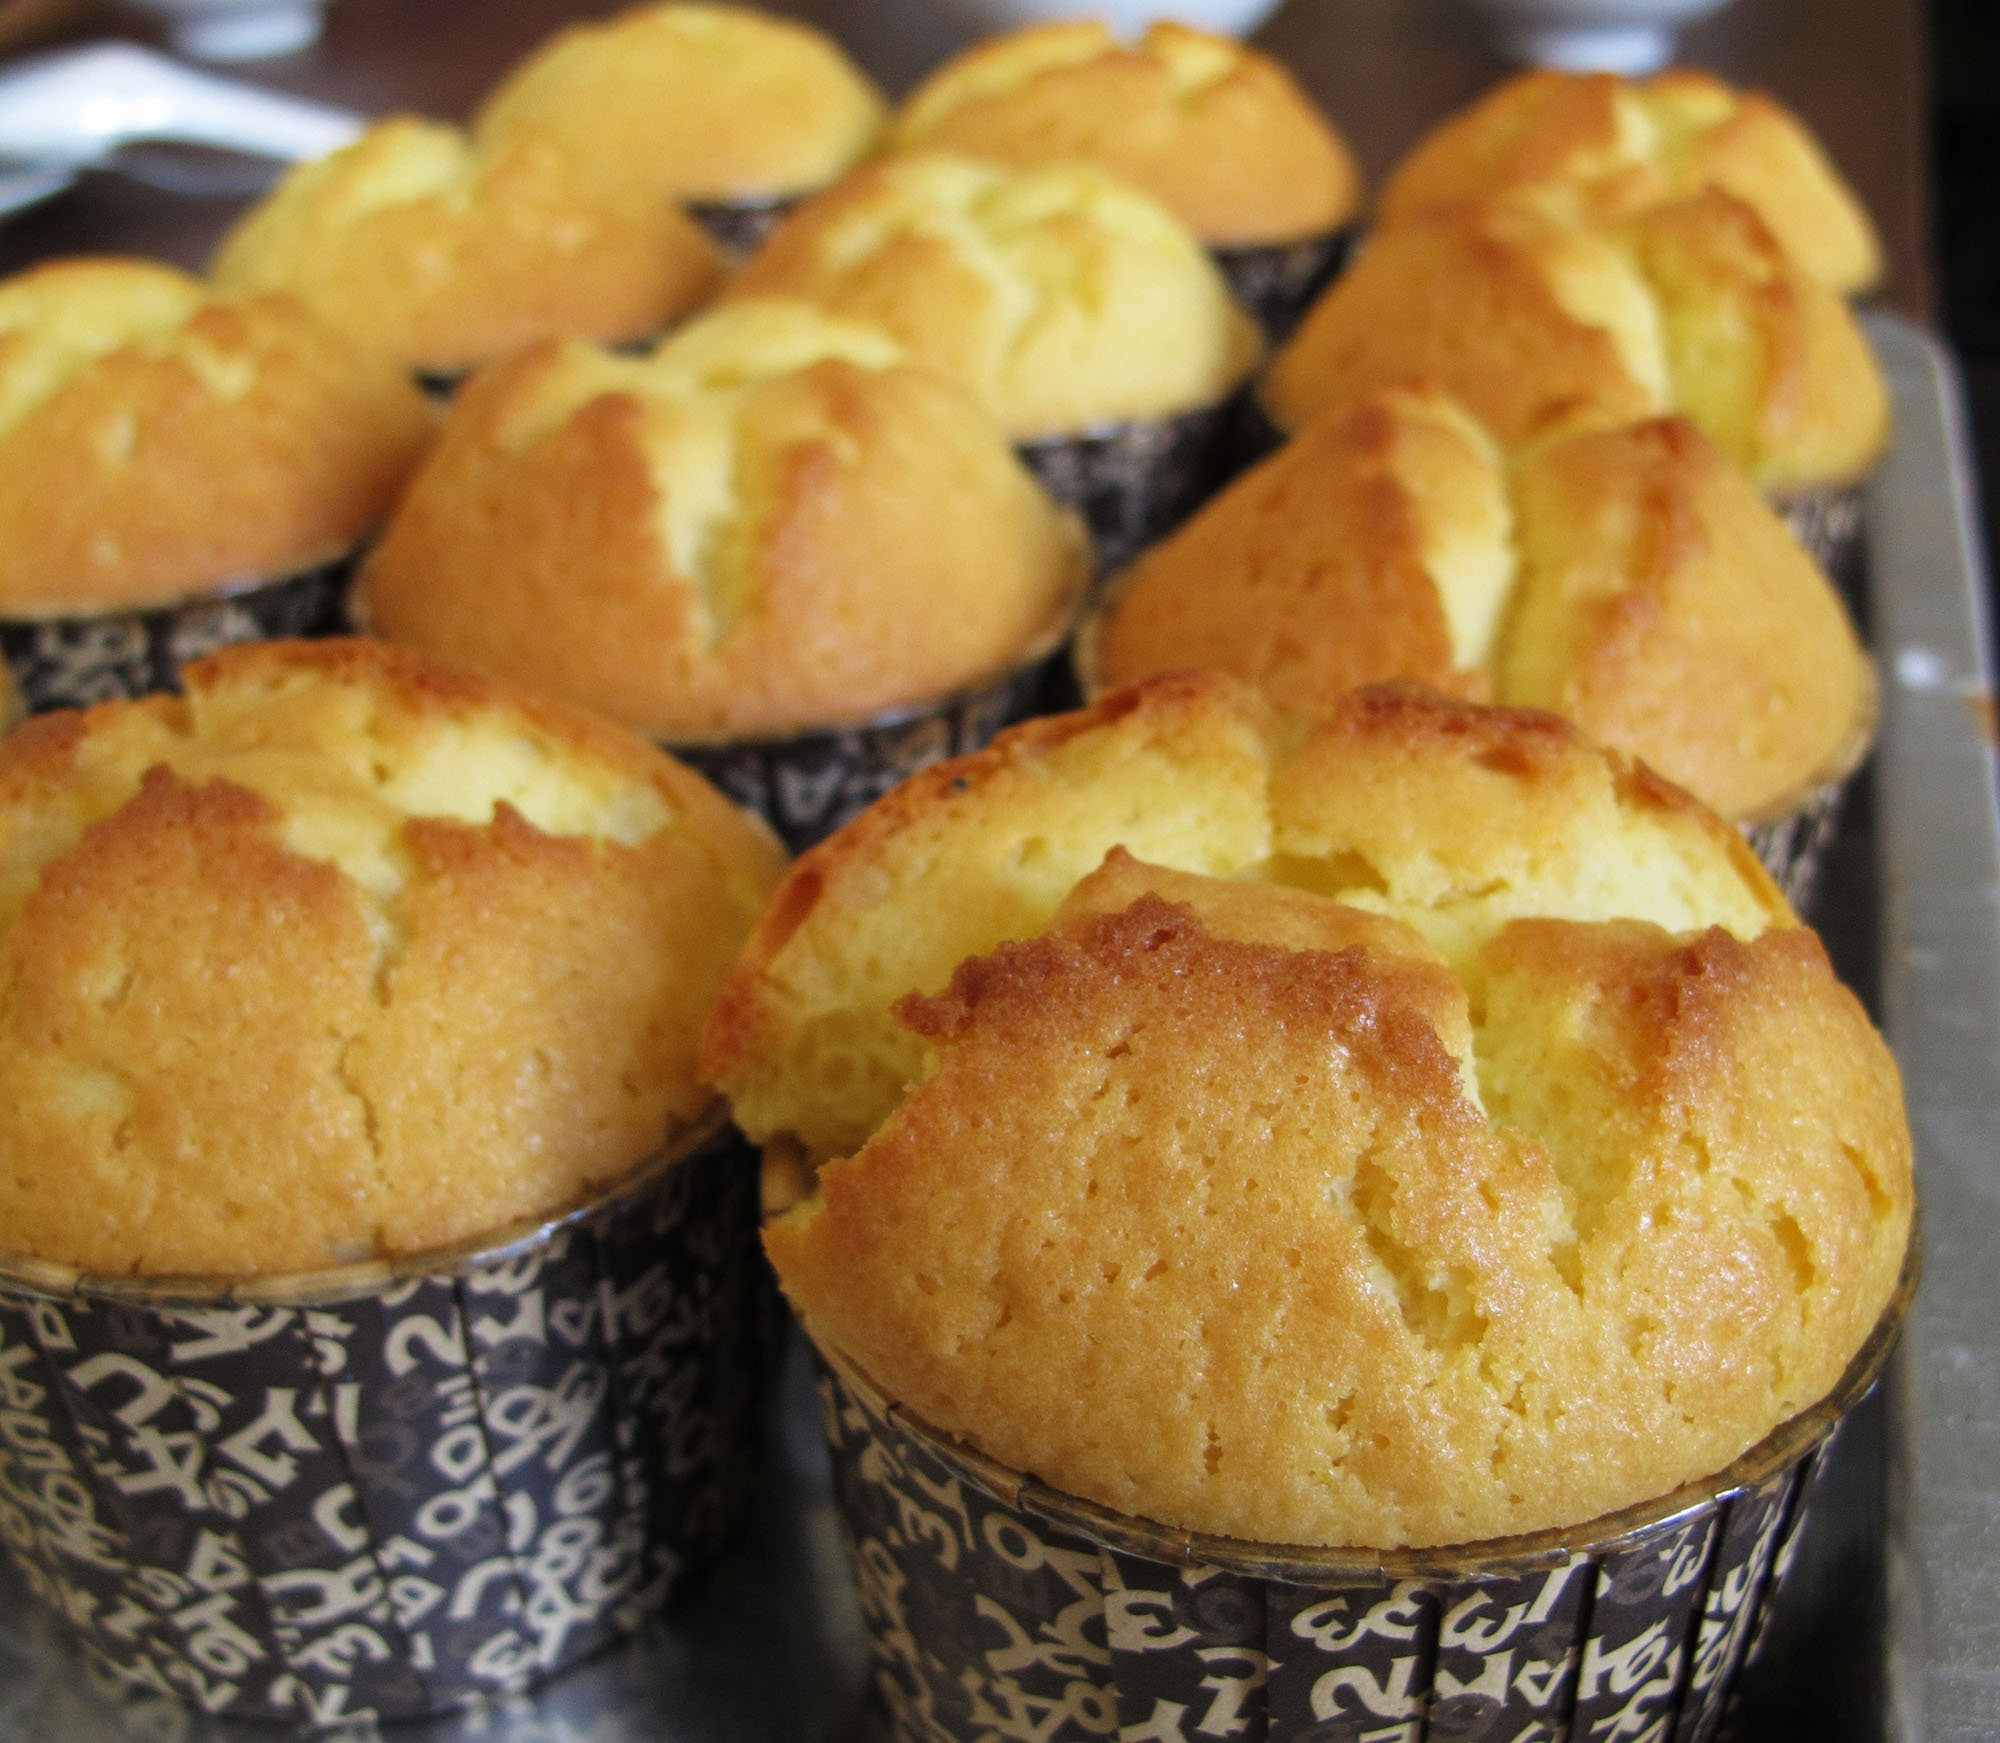 Orange Peel Muffin